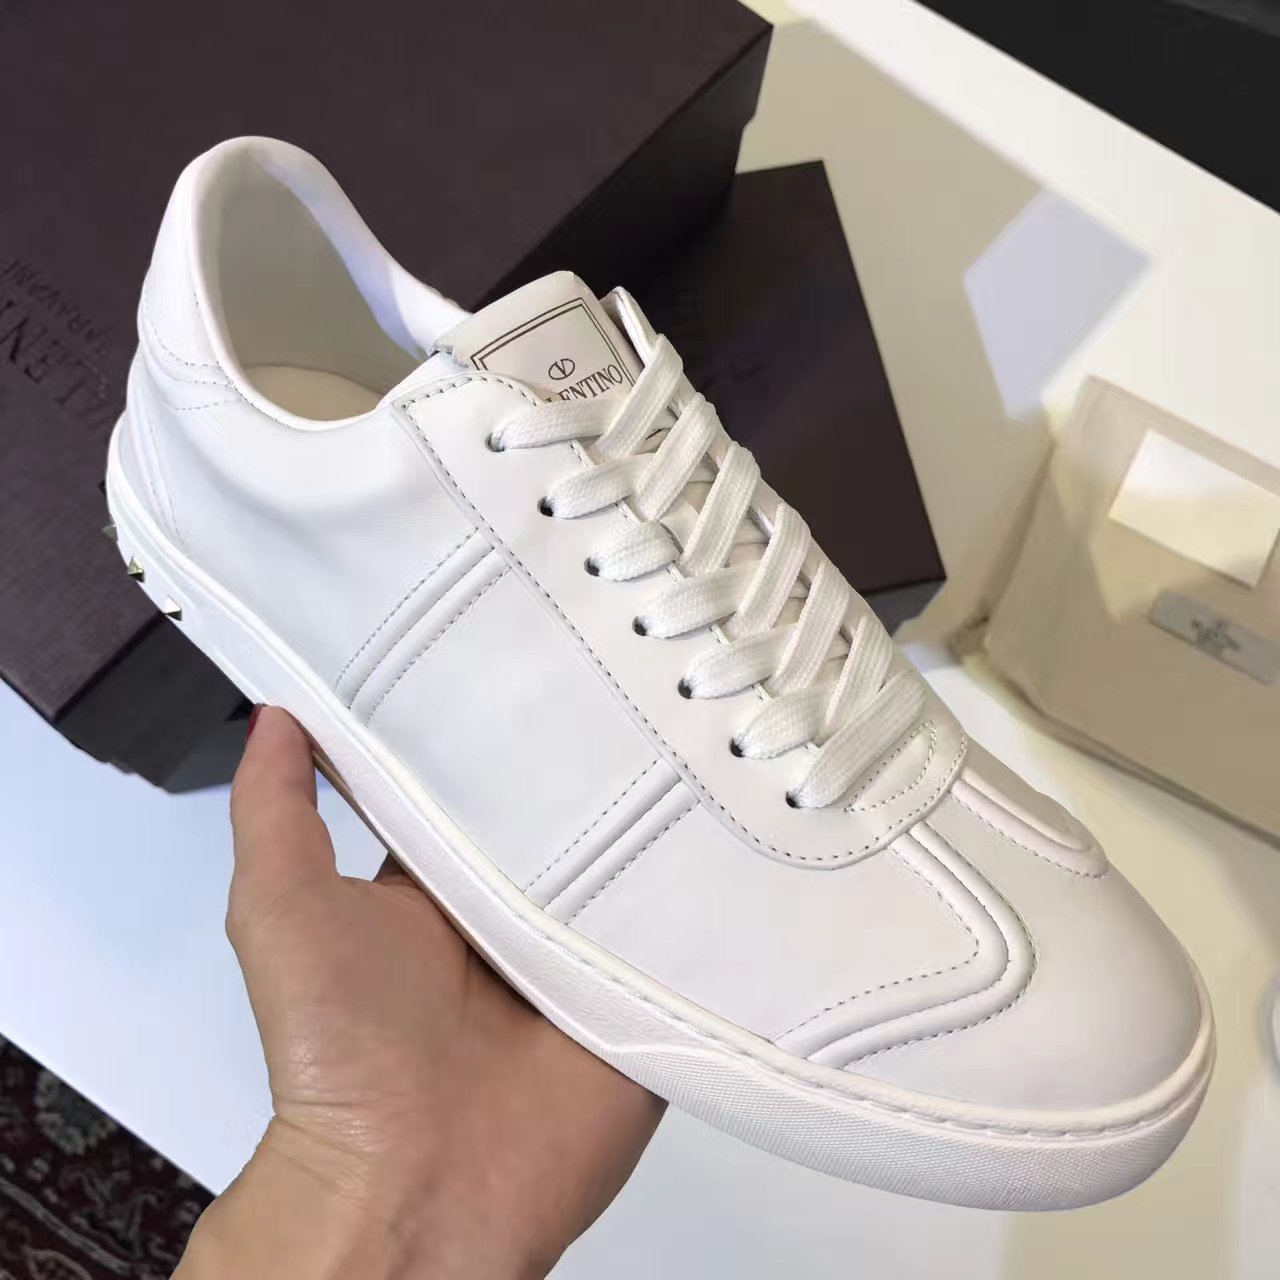 Valentino小白鞋 Garavani Flycrew 运动鞋 白色小牛皮休闲鞋